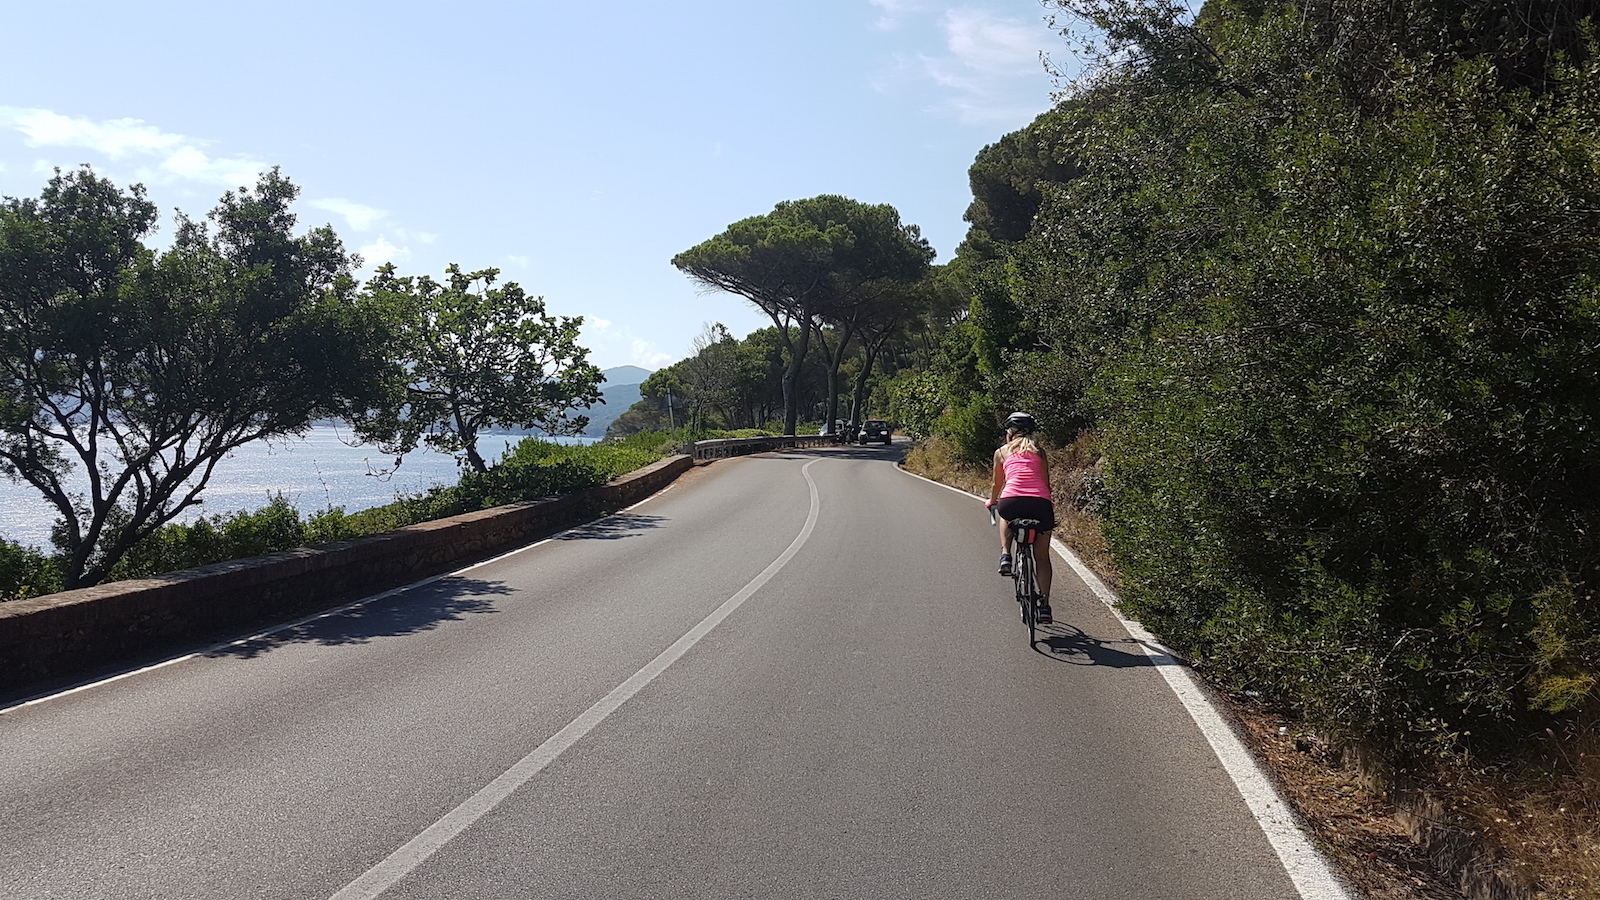 Isola d'Elba Ovest (DX) 18